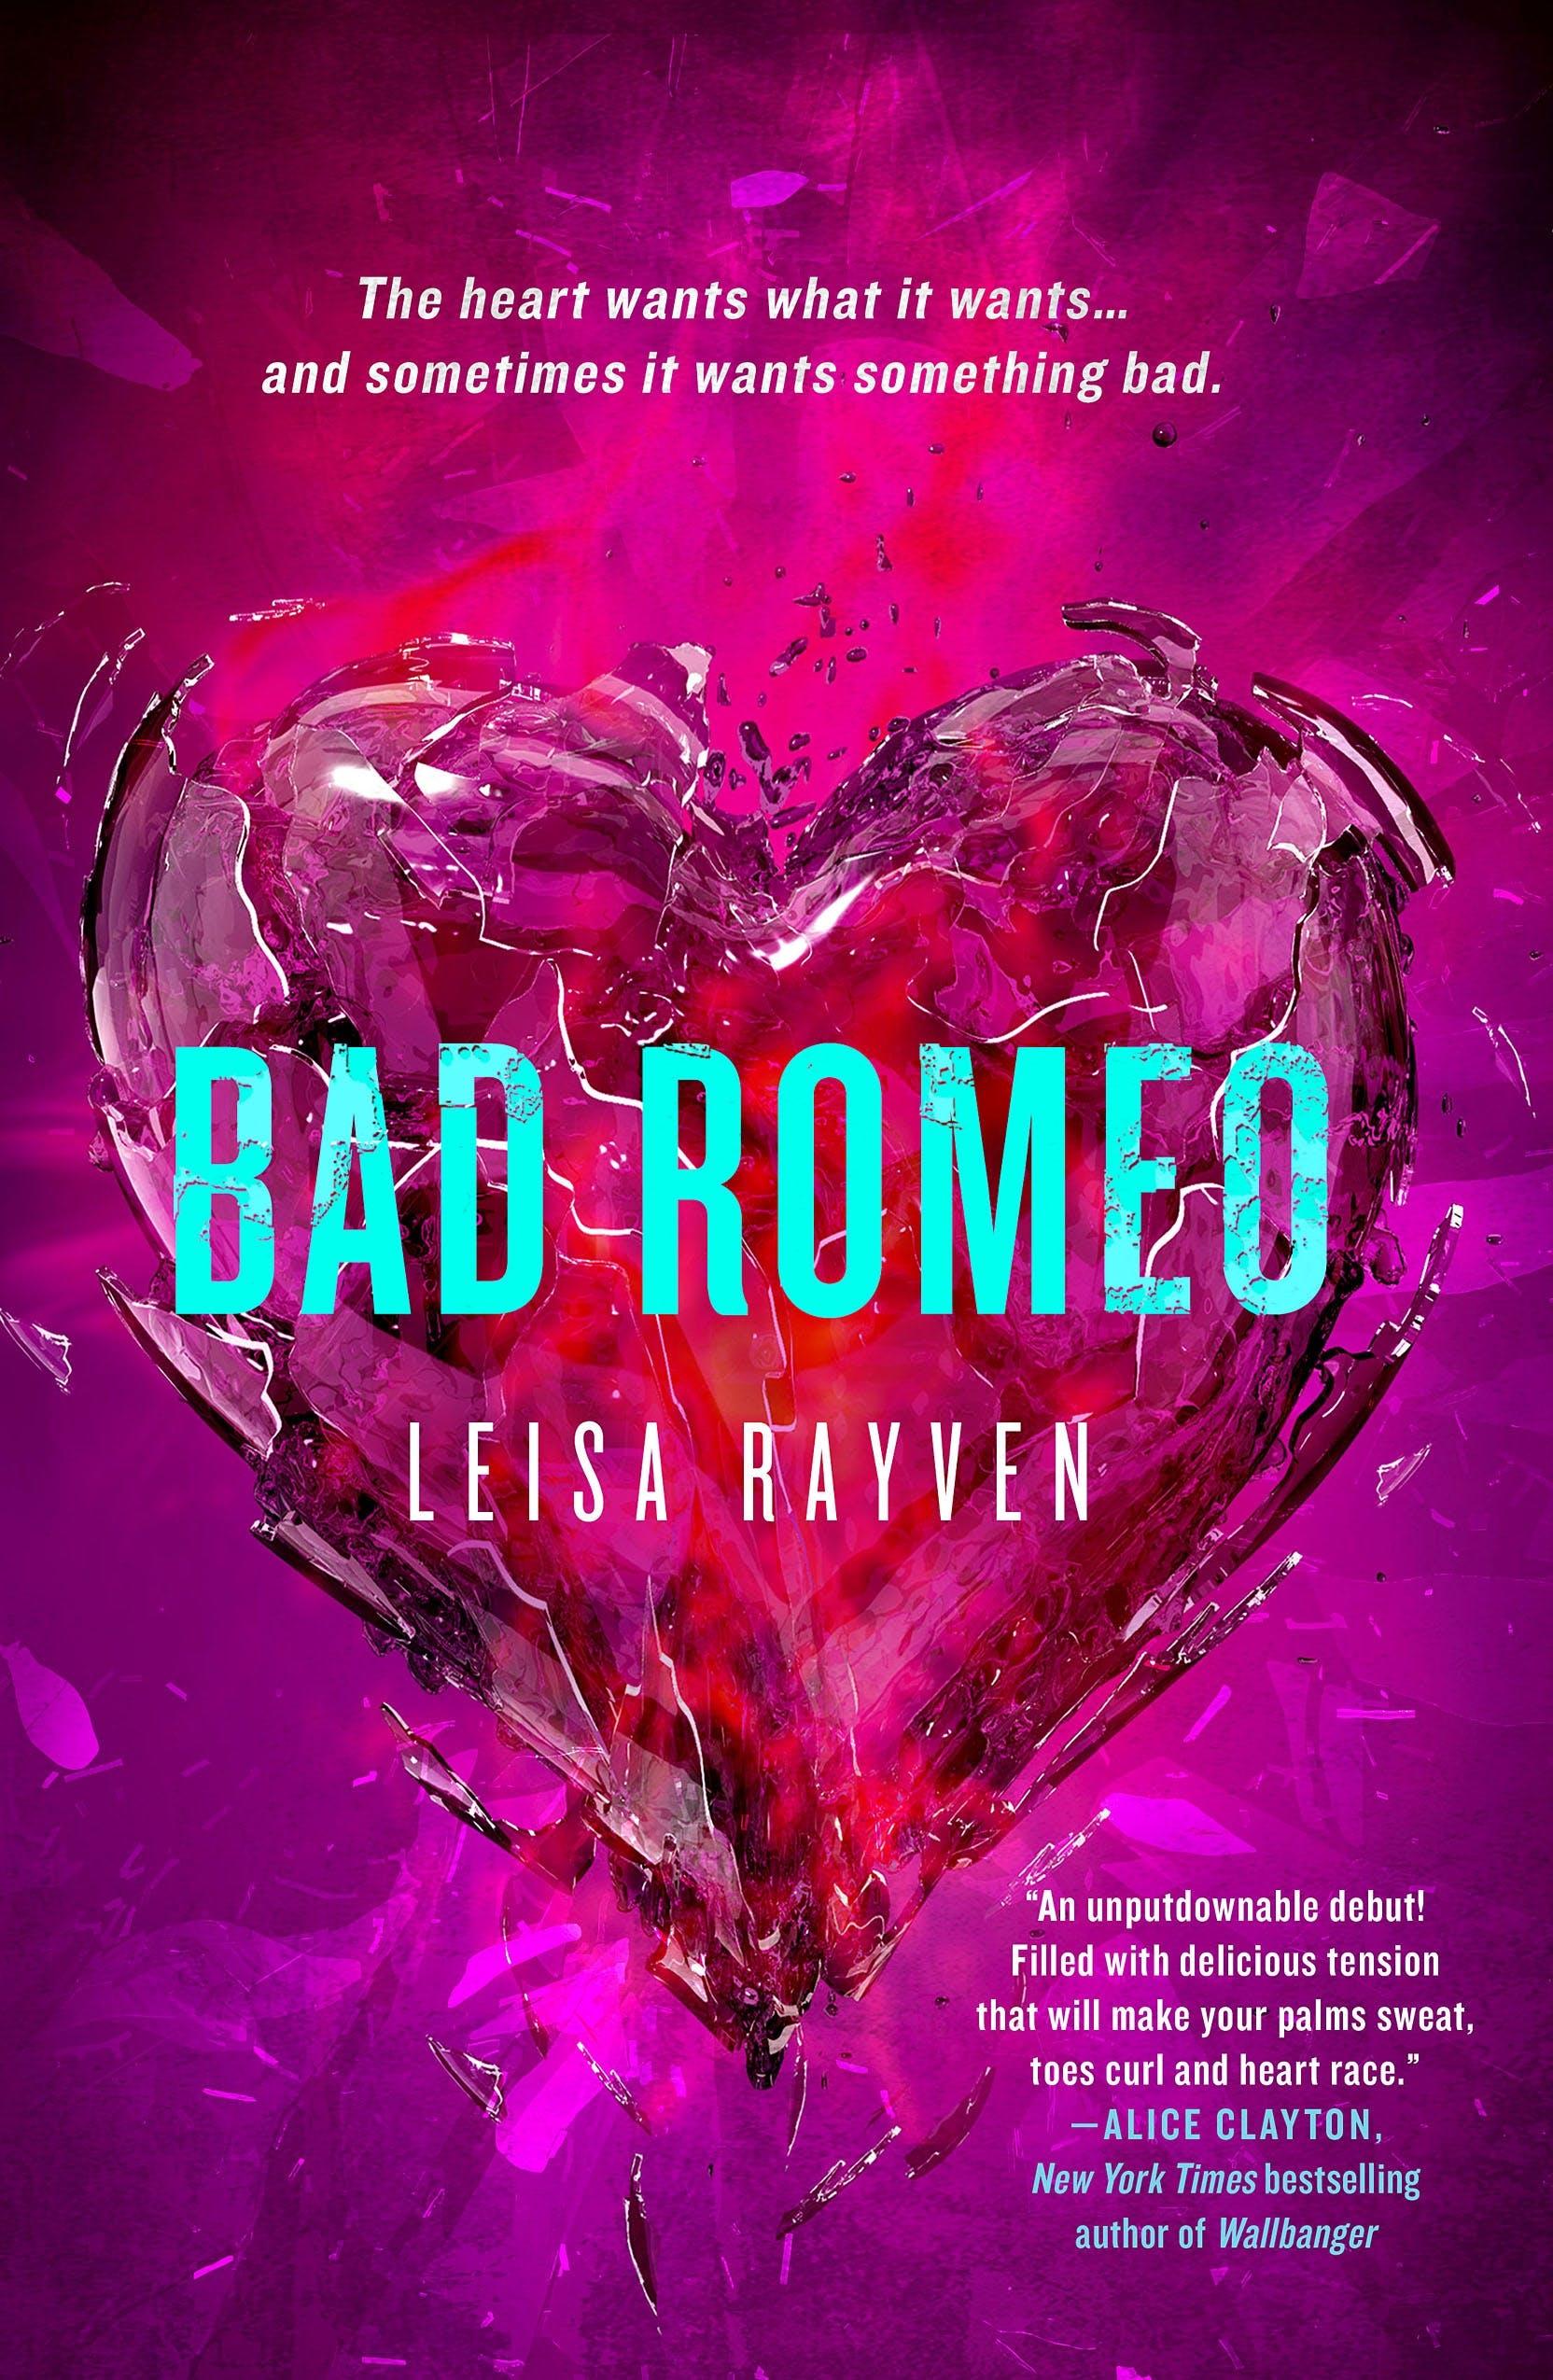 Image of Bad Romeo